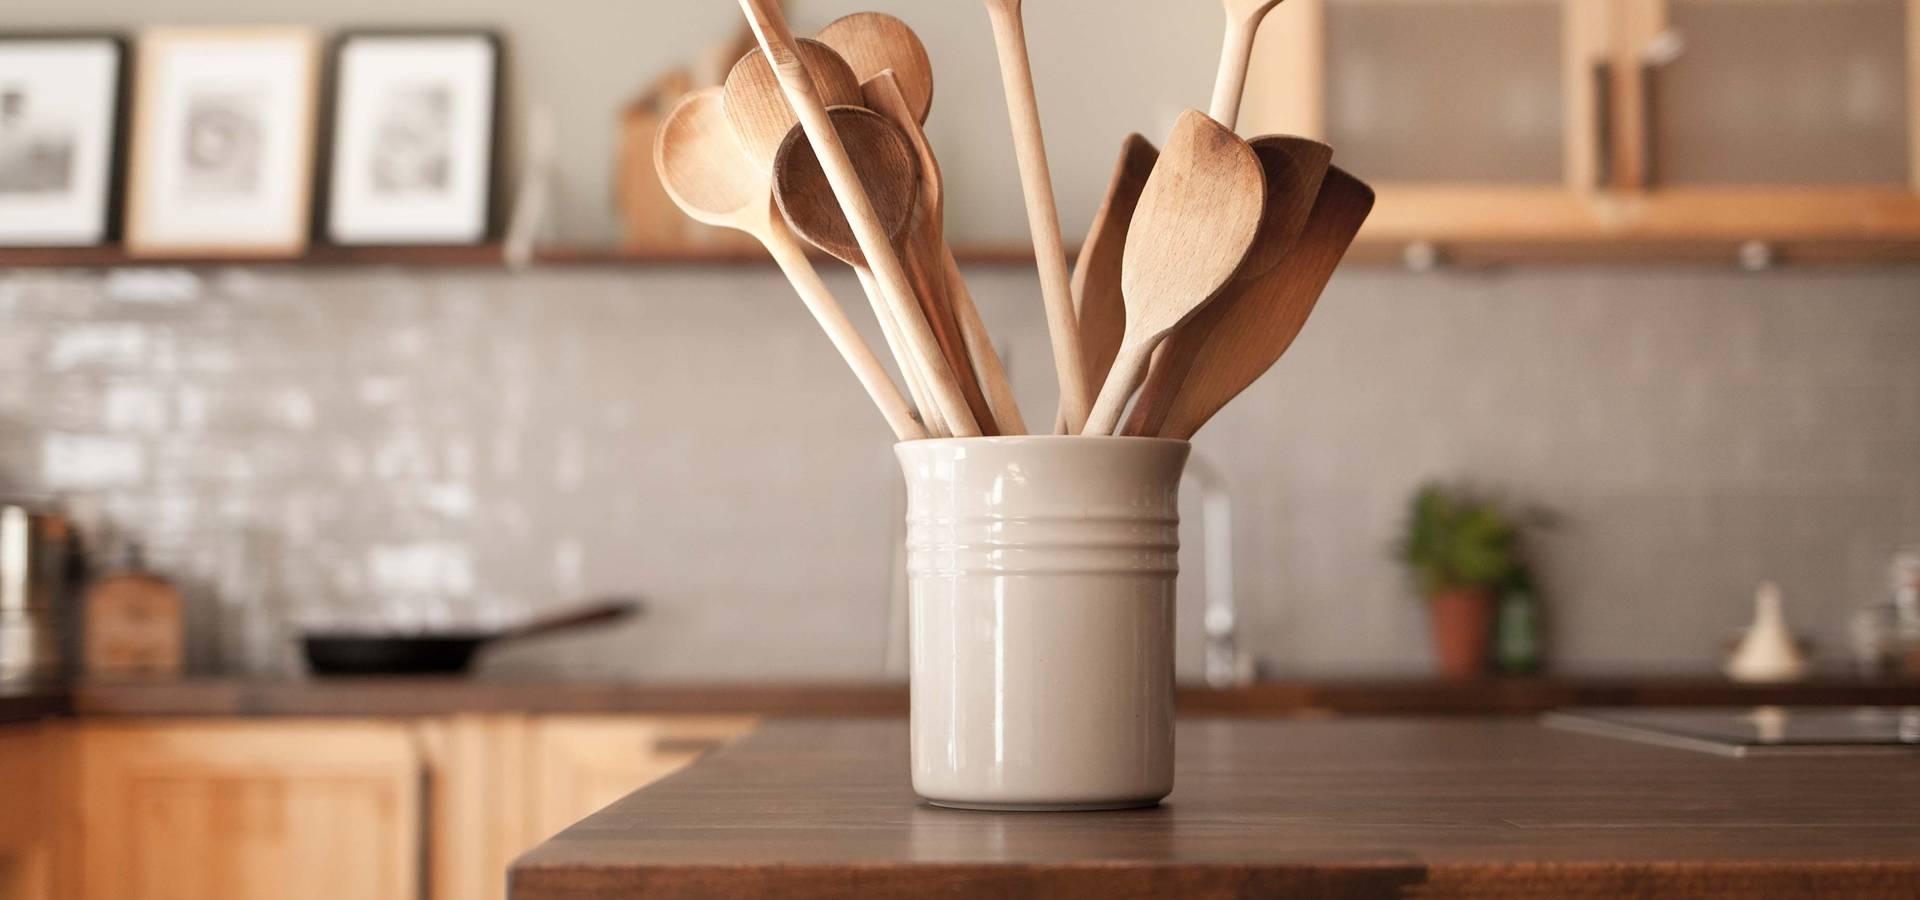 Kitchen Impossible e.K.